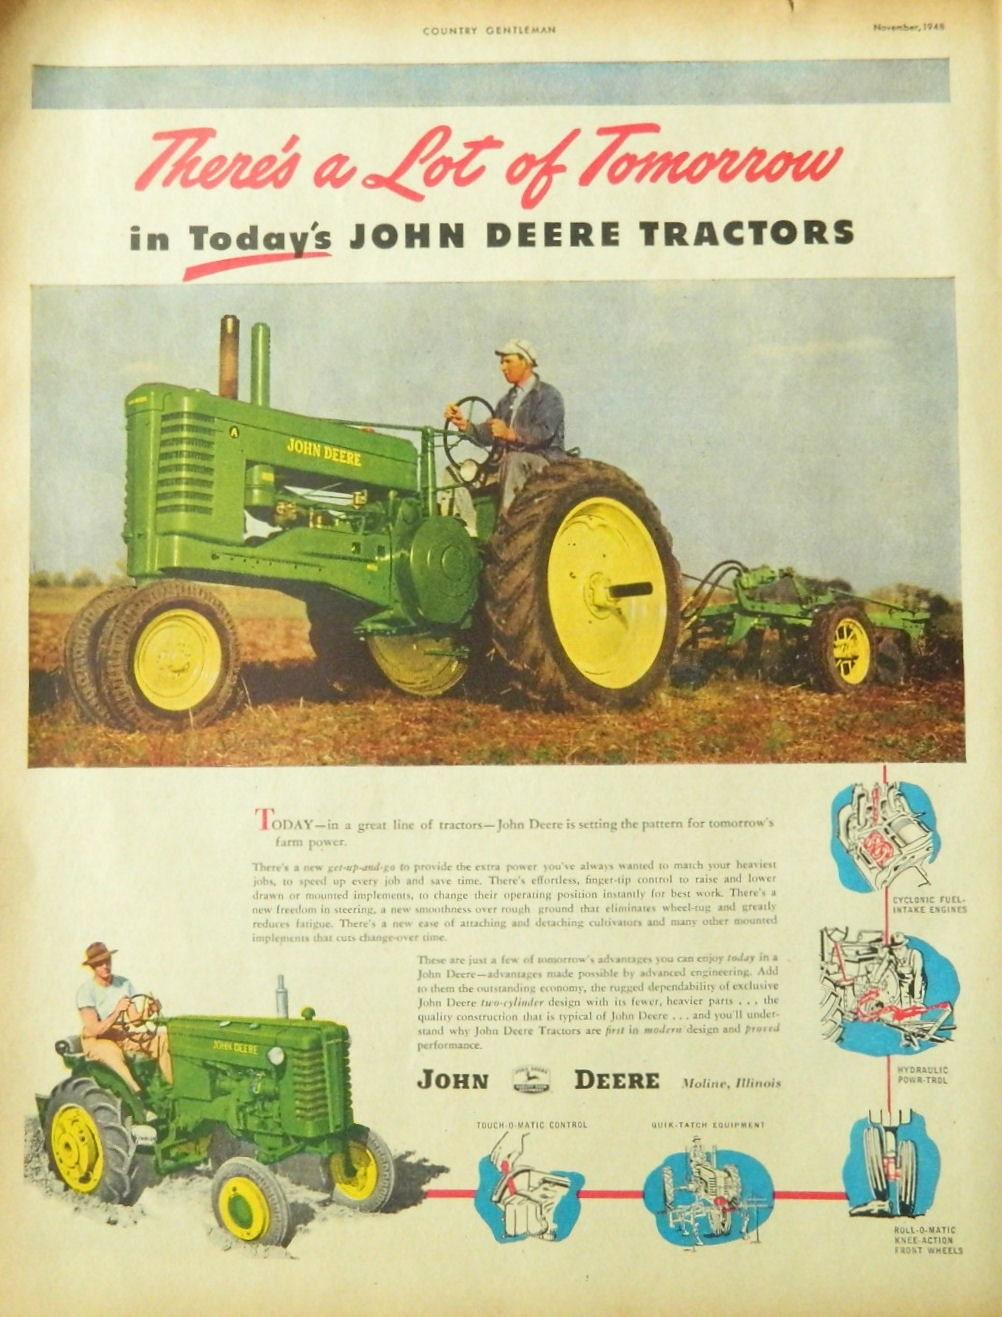 John Deere Tractor Ad : Vintage john deere tractor ad wall art or collectible